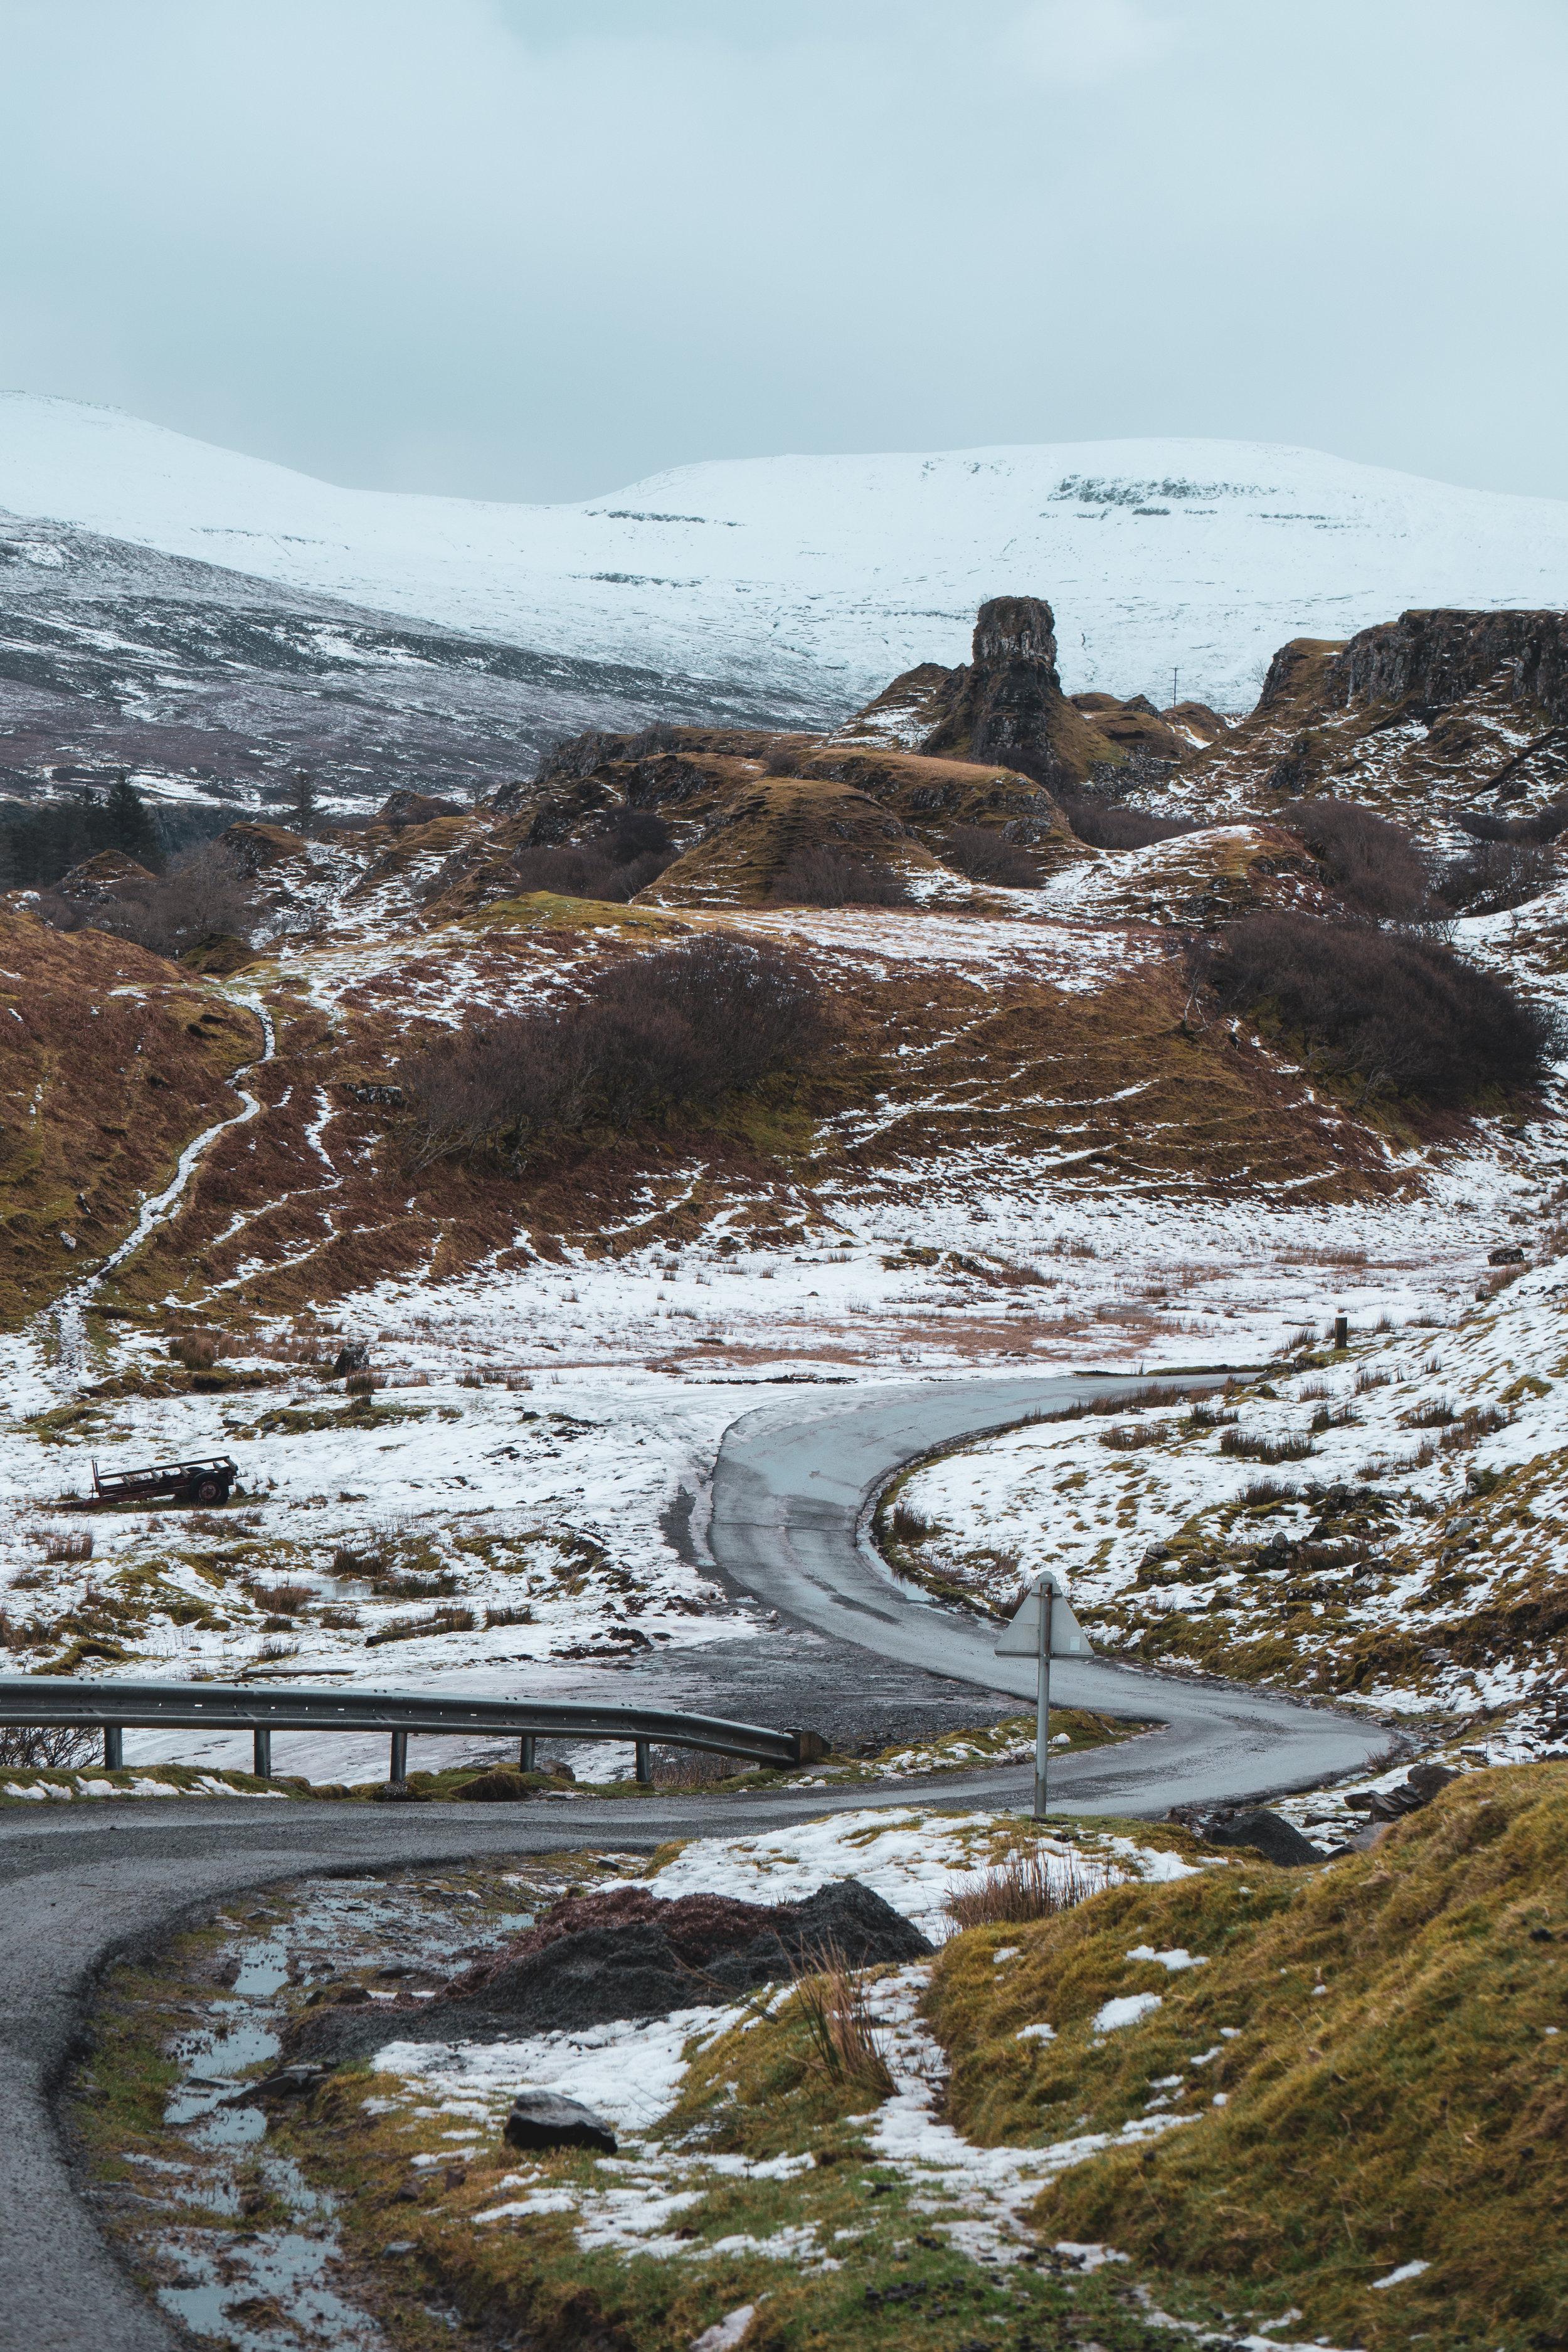 Isle-of-Skye-Fairy-Glen-und-Braes (13).jpg